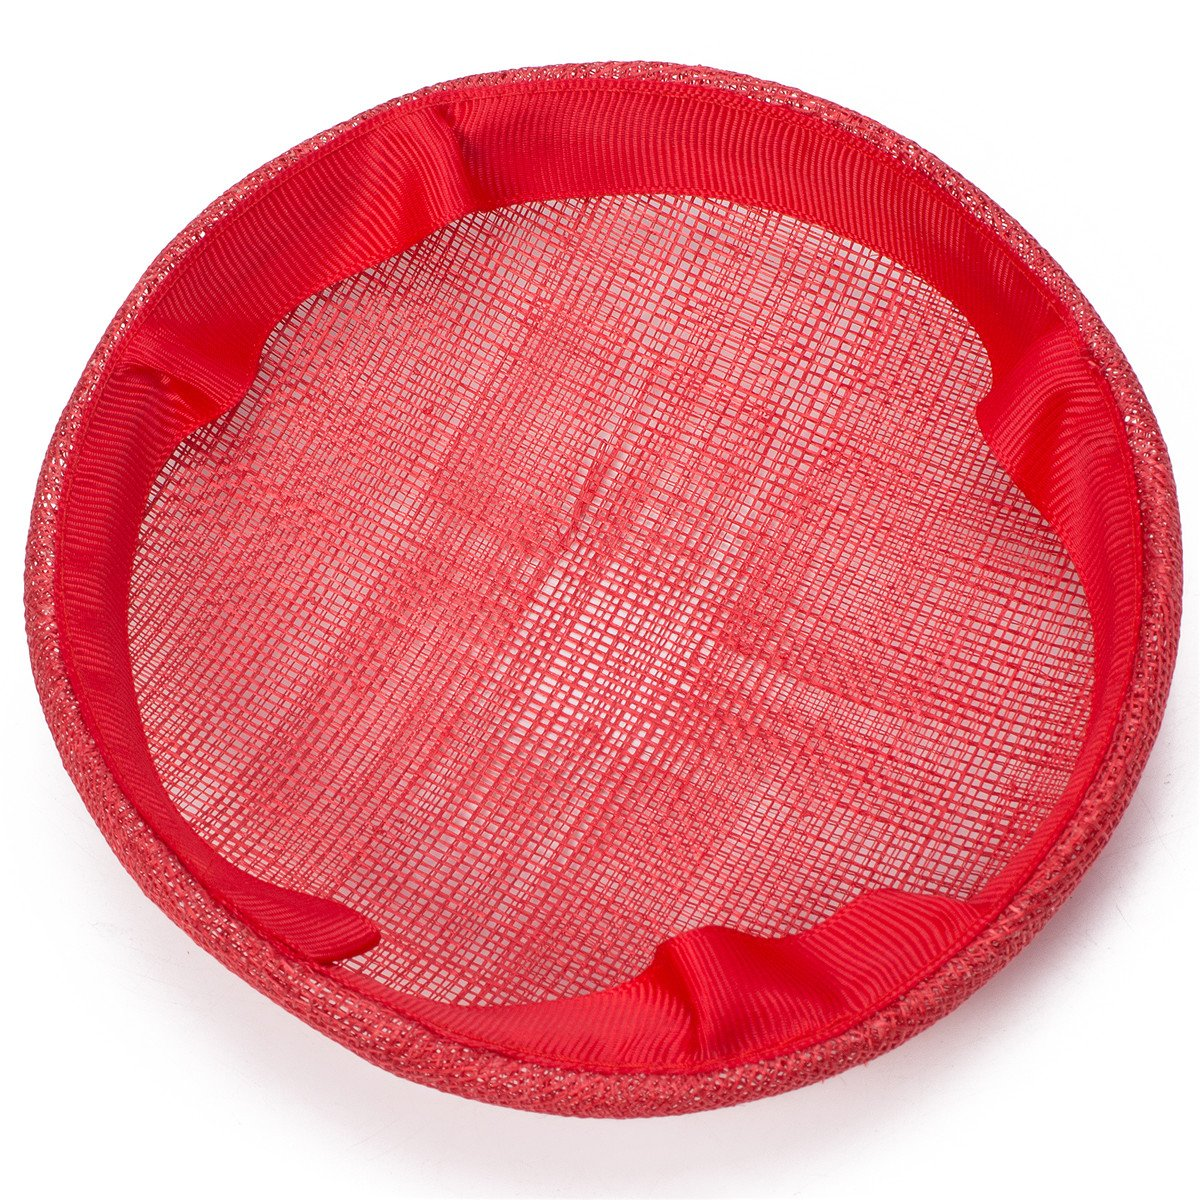 Lawliet 6.1 Round Sinamay Button Pillbox millinery Fascinator Hat Base Craft B065